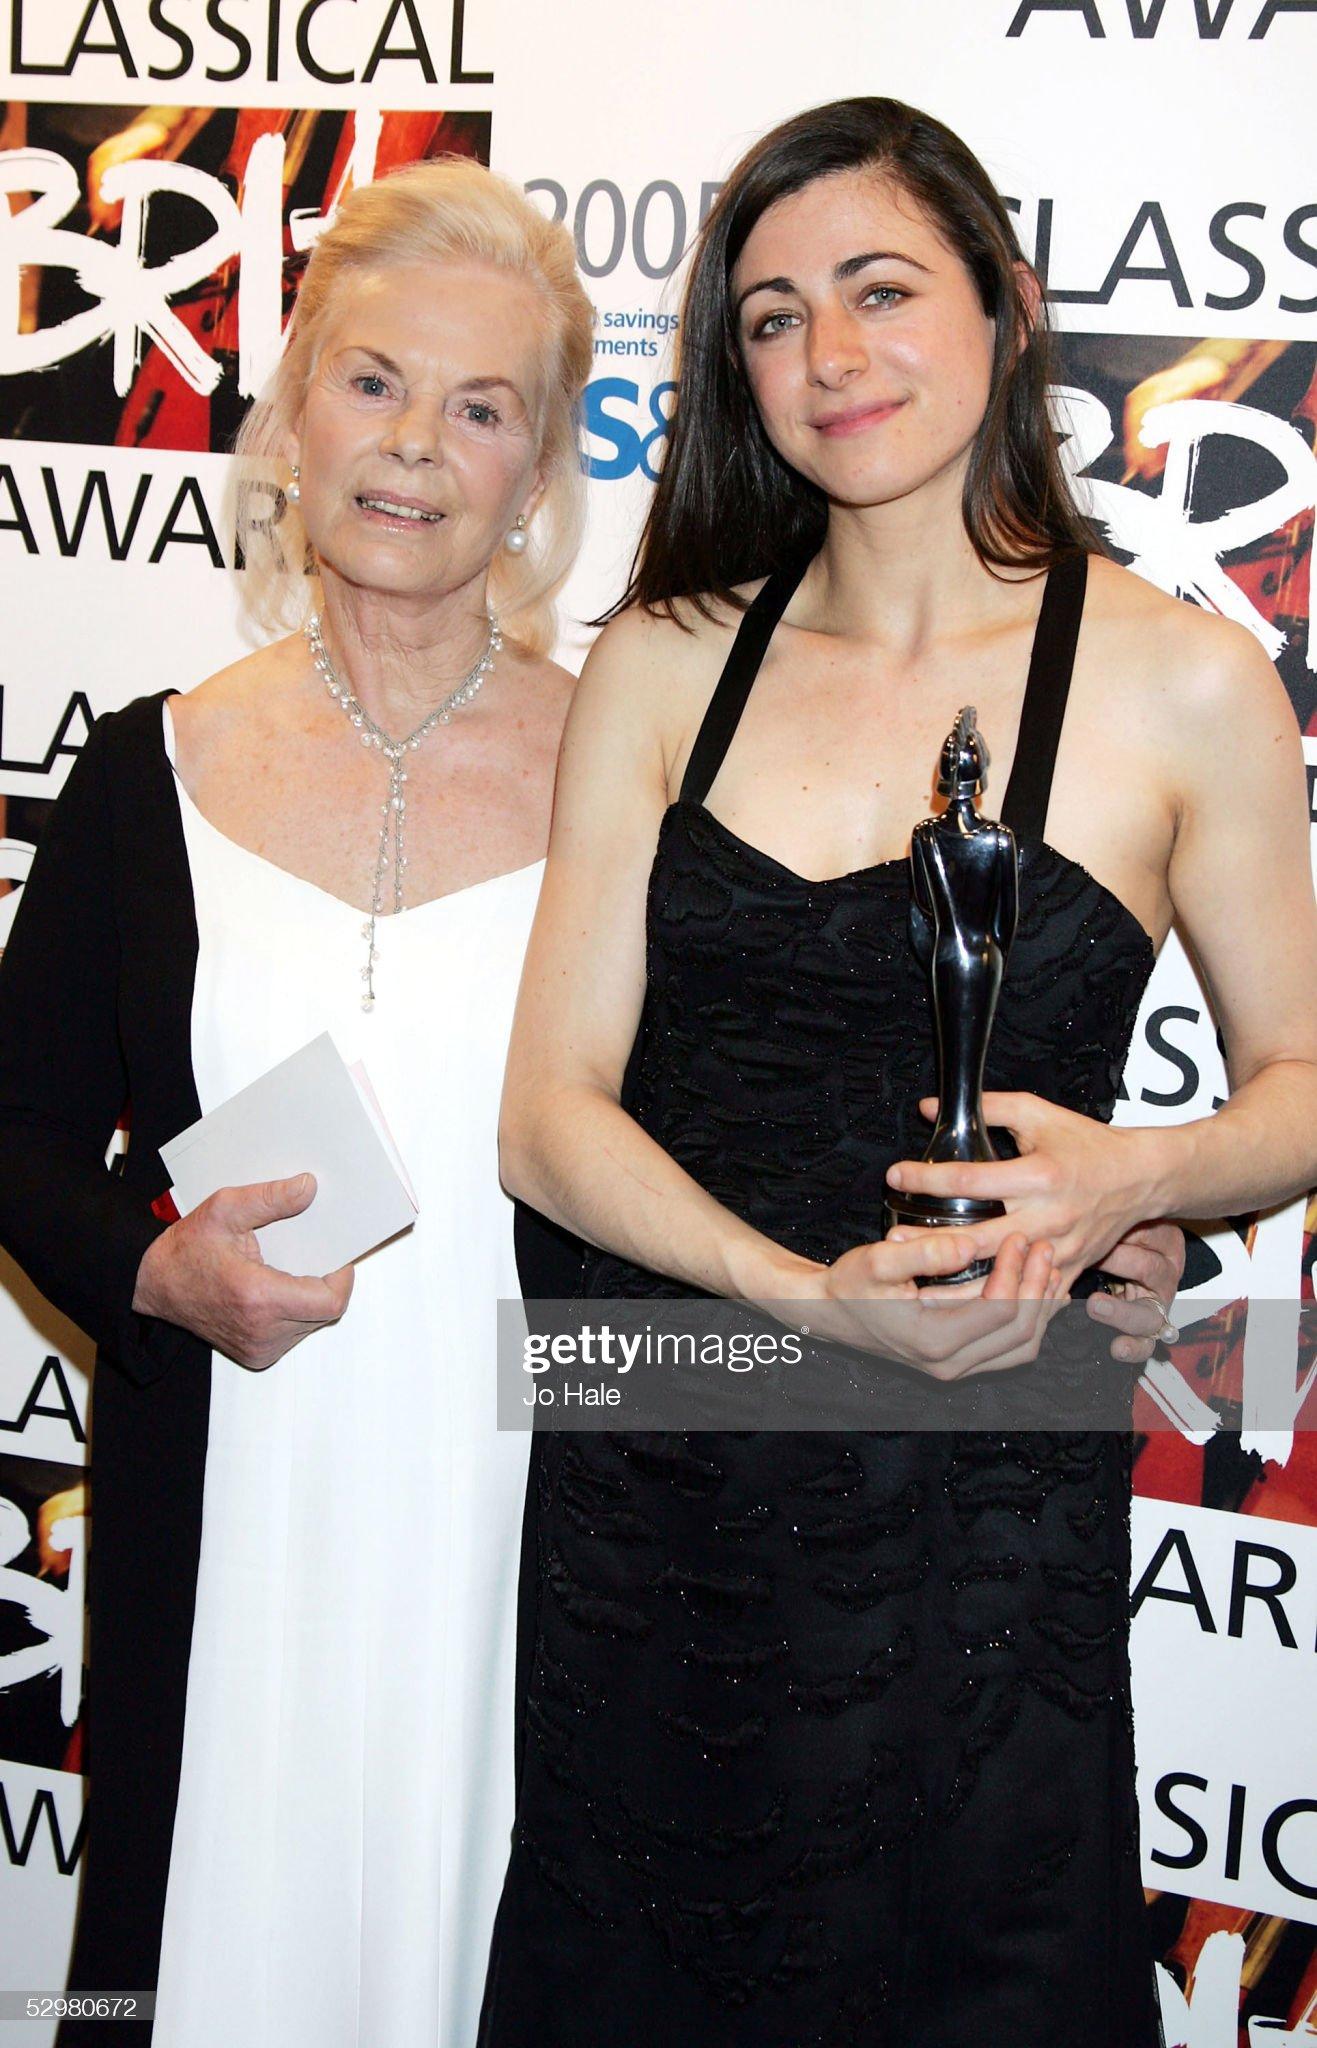 Classical Brit Awards 2005 - Pressroom : News Photo